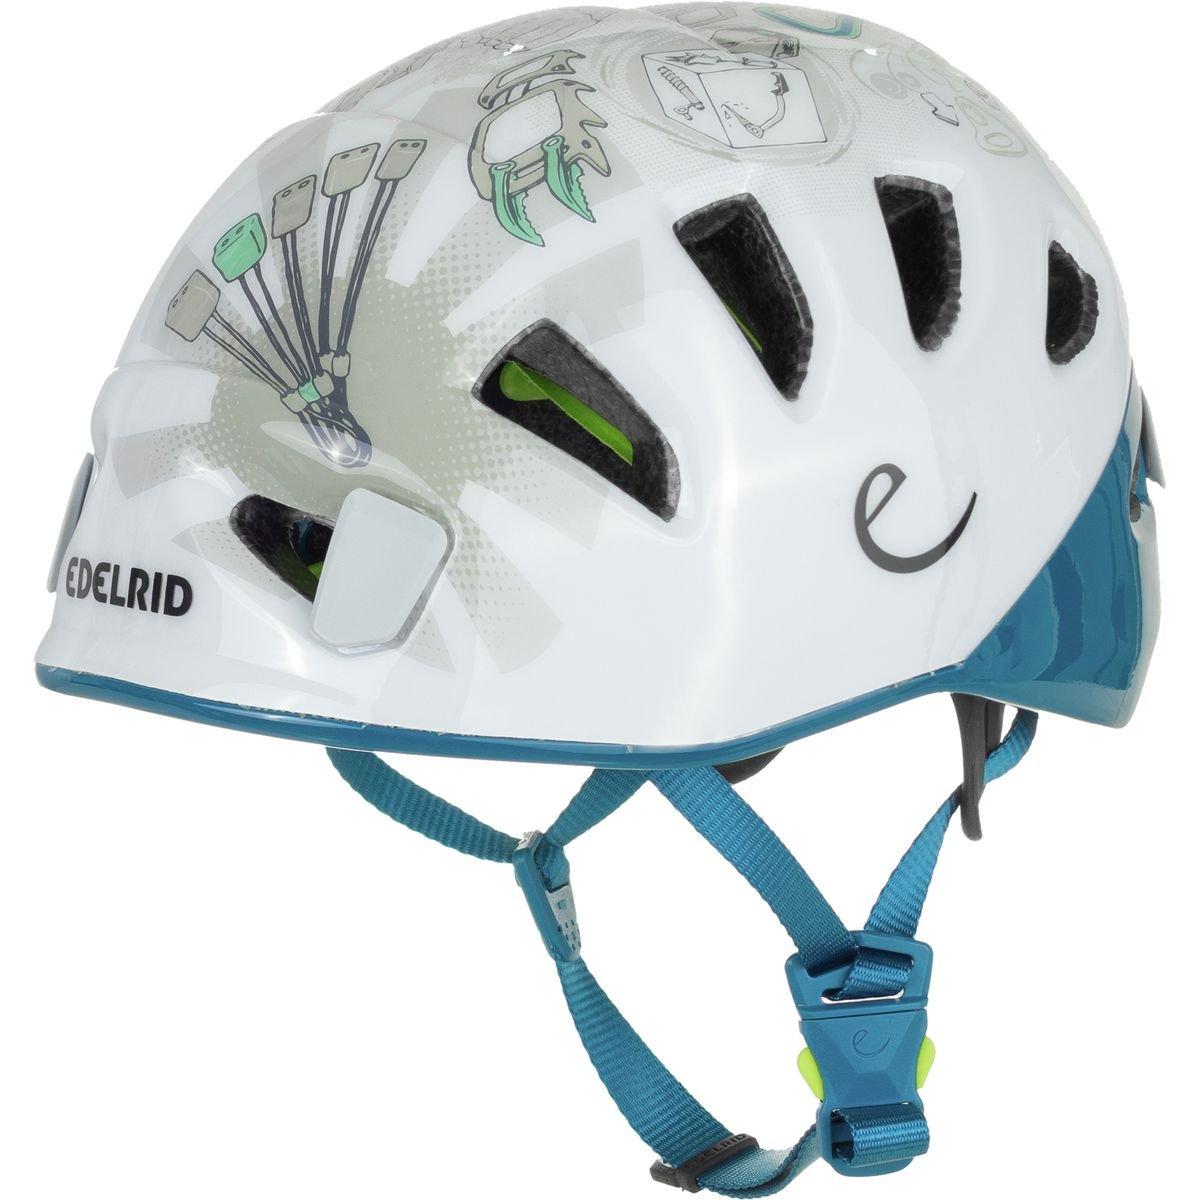 EDELRID Shield II Softshell Climbing Helmet by EDELRID